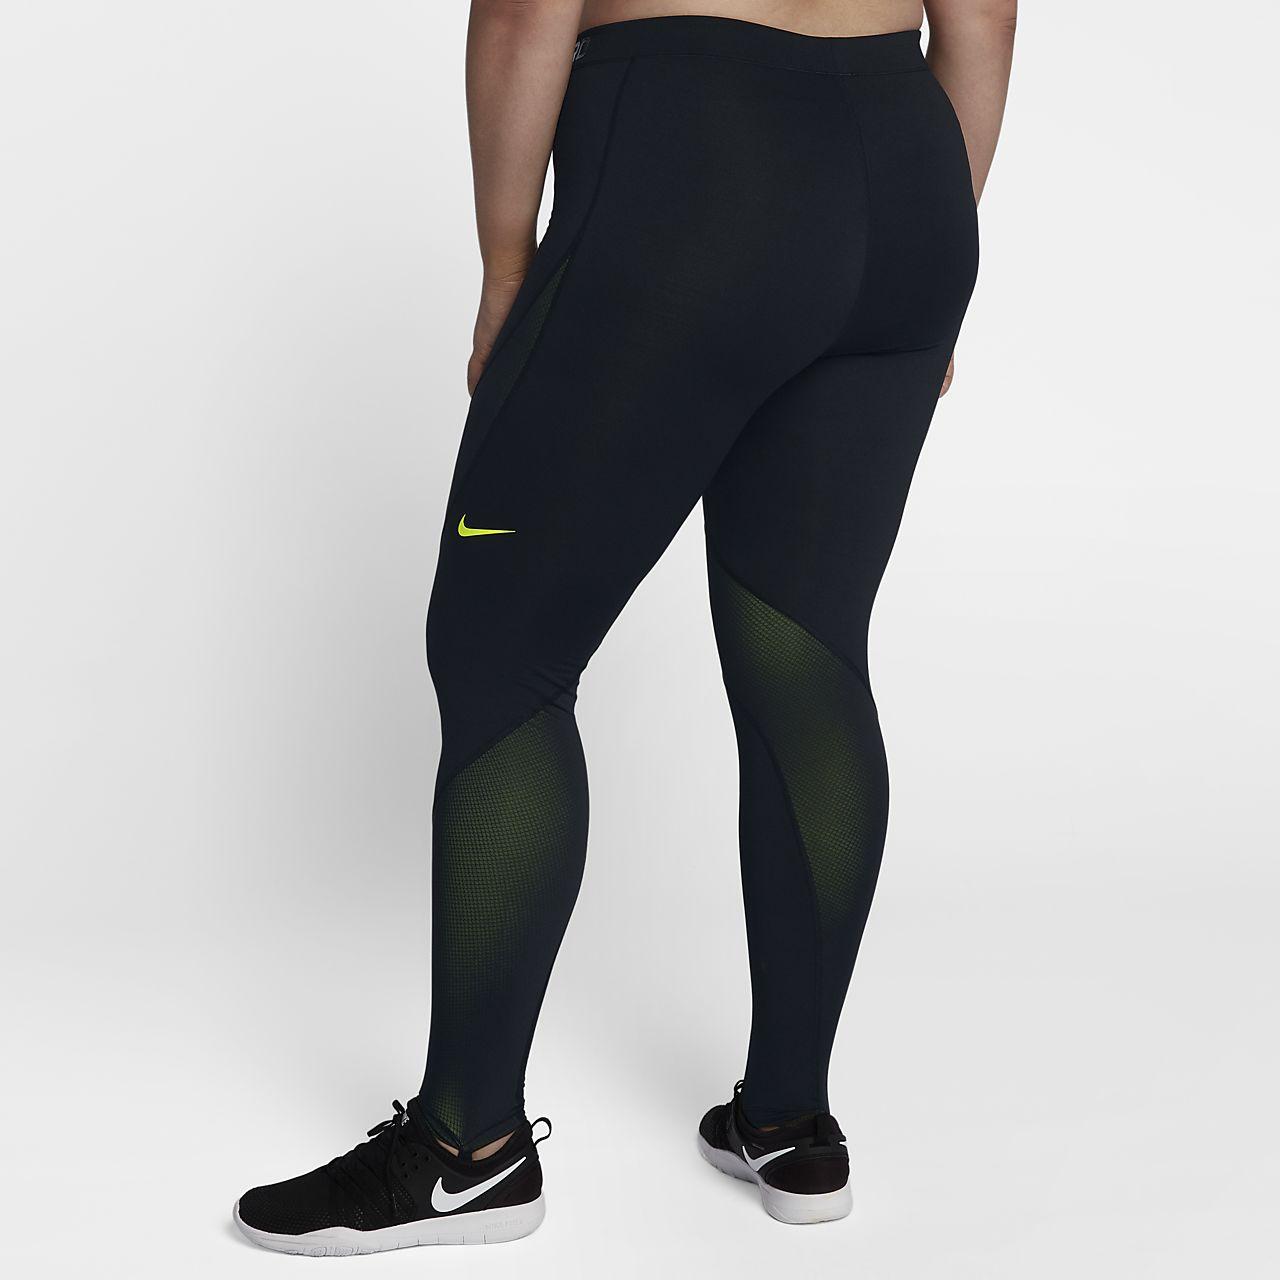 ... Nike Pro HyperWarm (Plus Size) Women's Training Tights